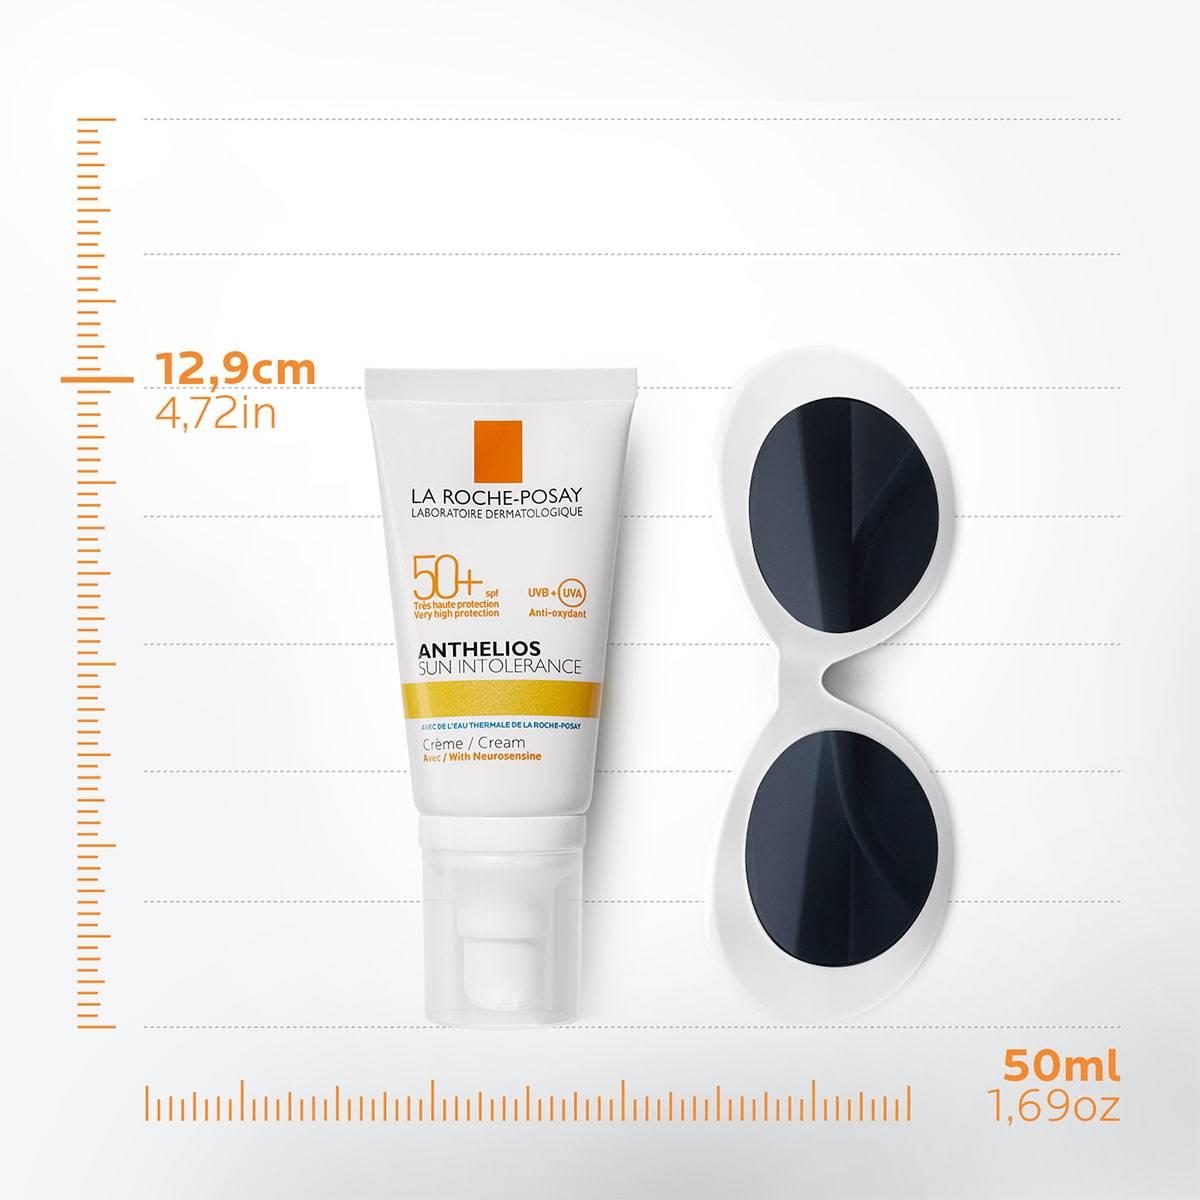 La Roche Posay ProductPage Sun Anthelios Med Sun Intolerance Spf50 50m